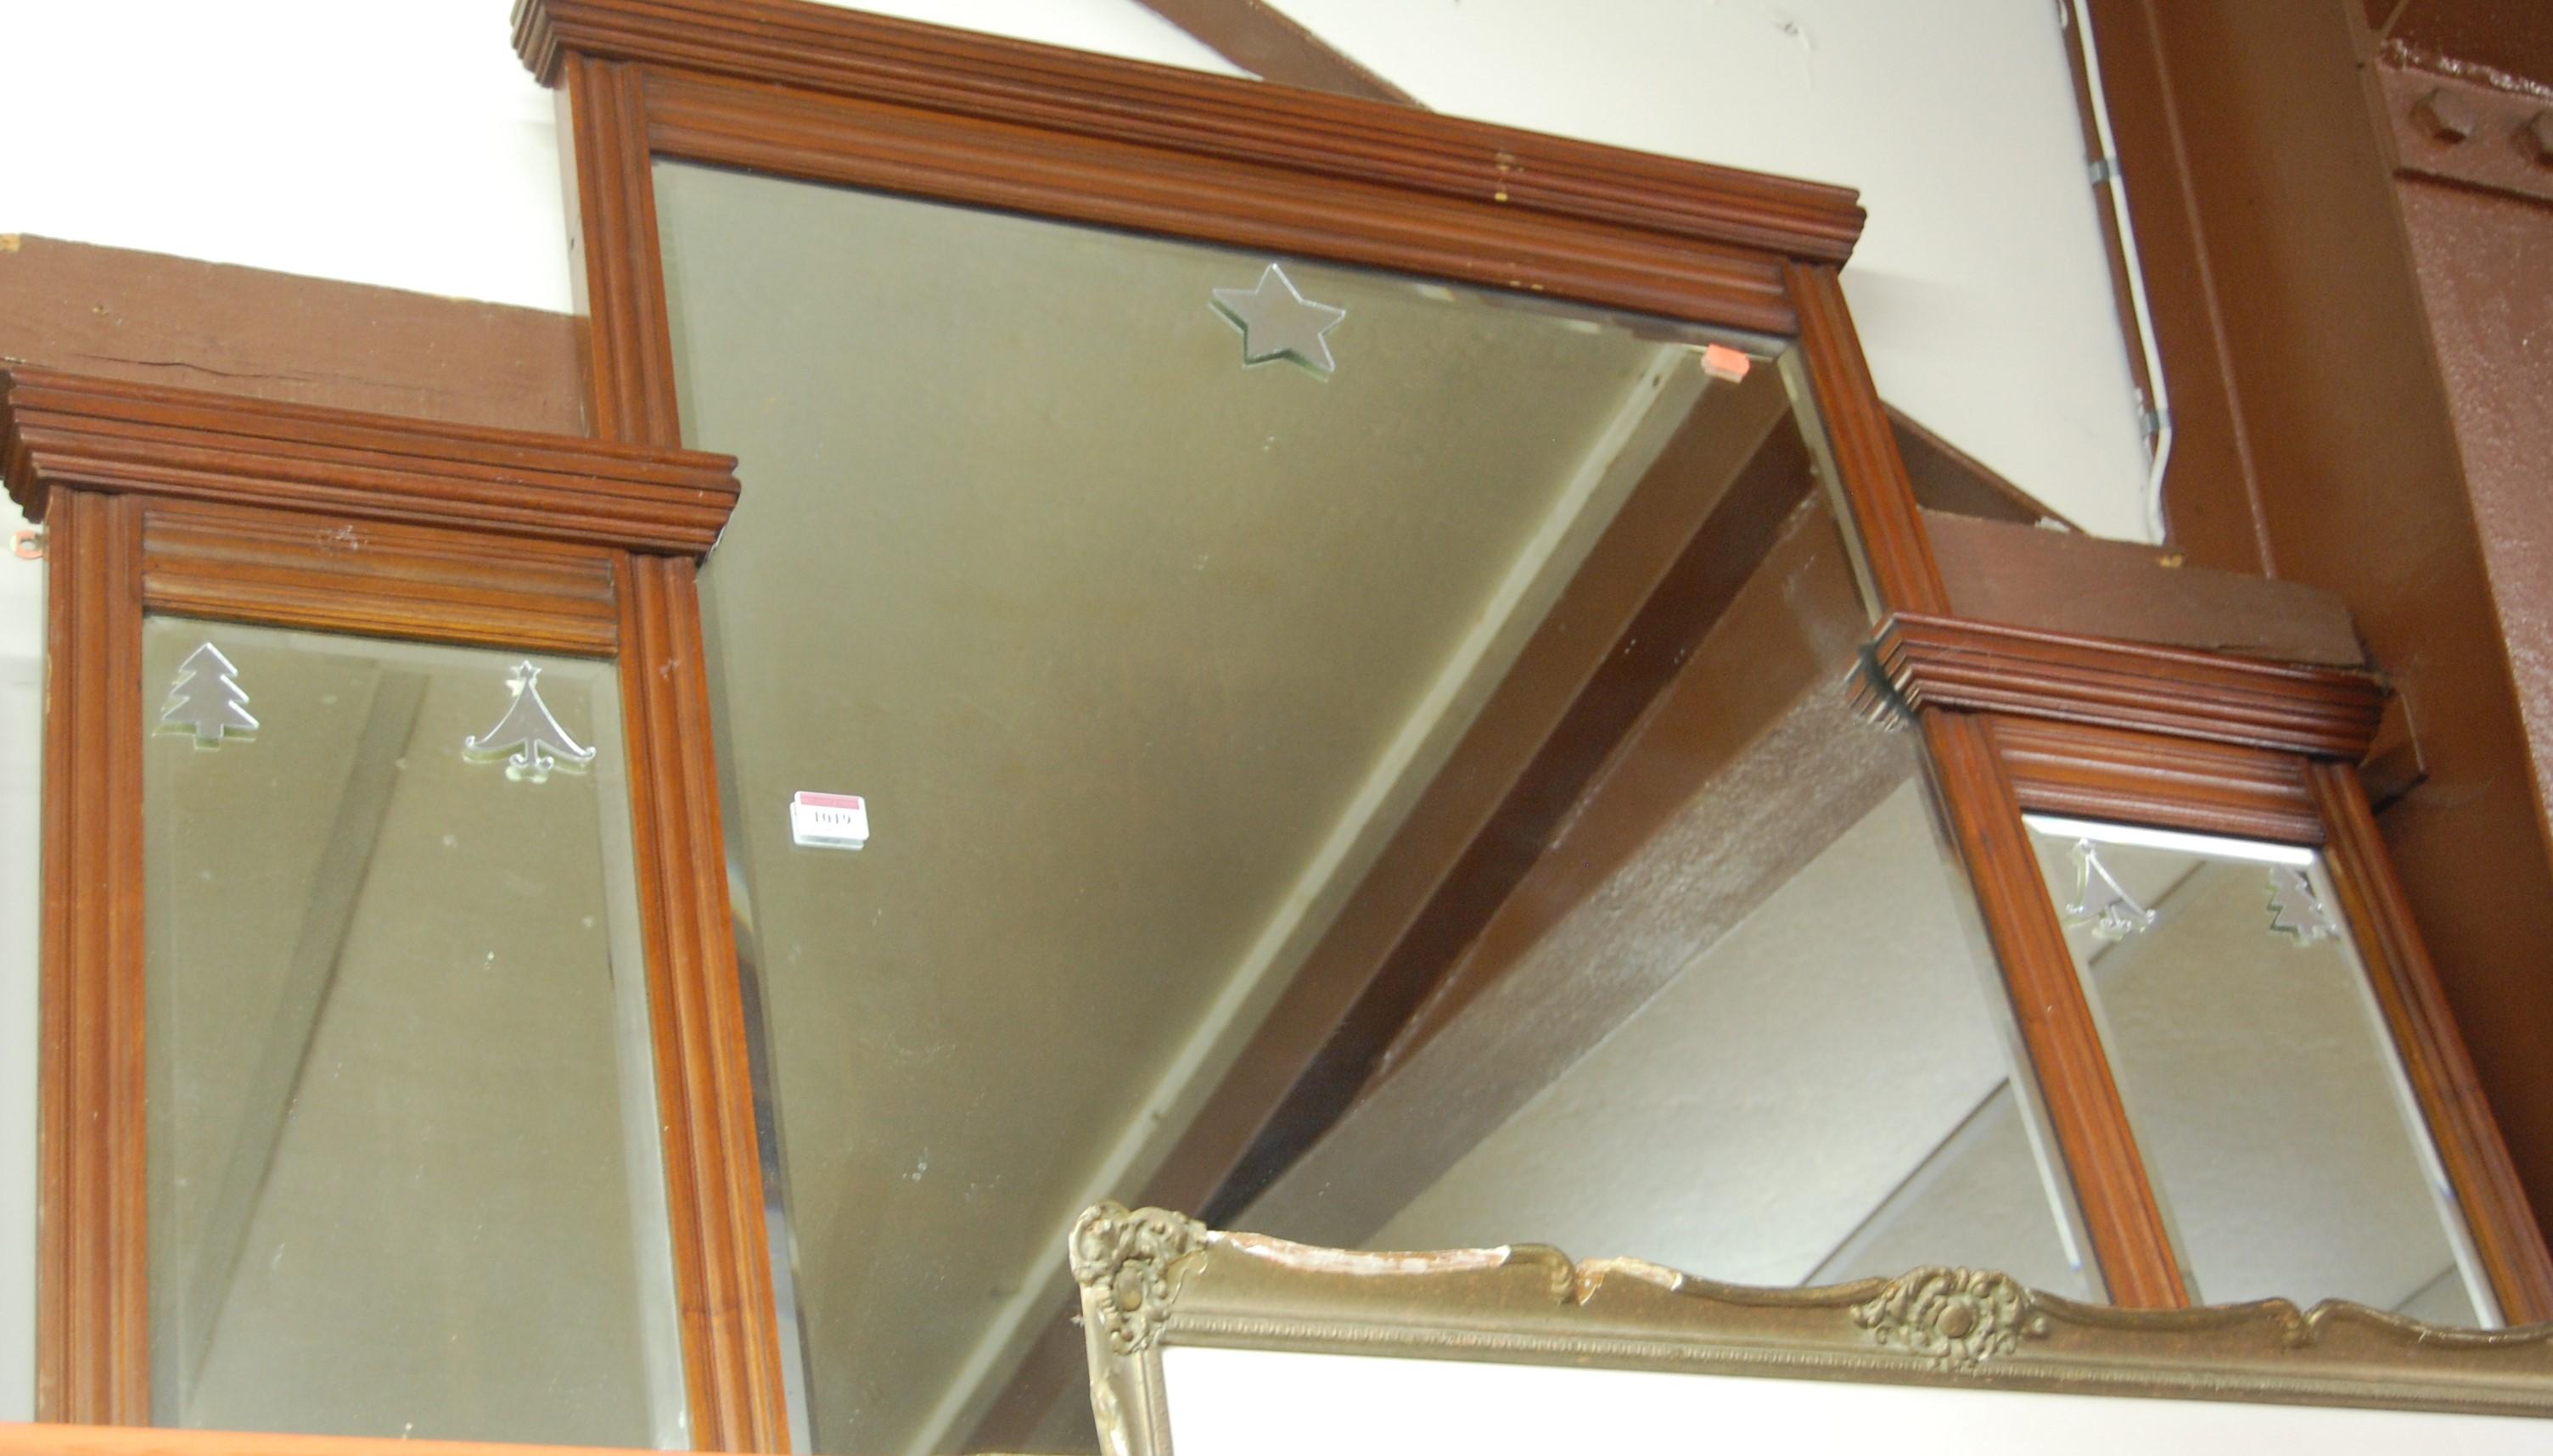 Lot 1019 - Circa 1900 walnut framed triptych overmantel mirror, width 122cm